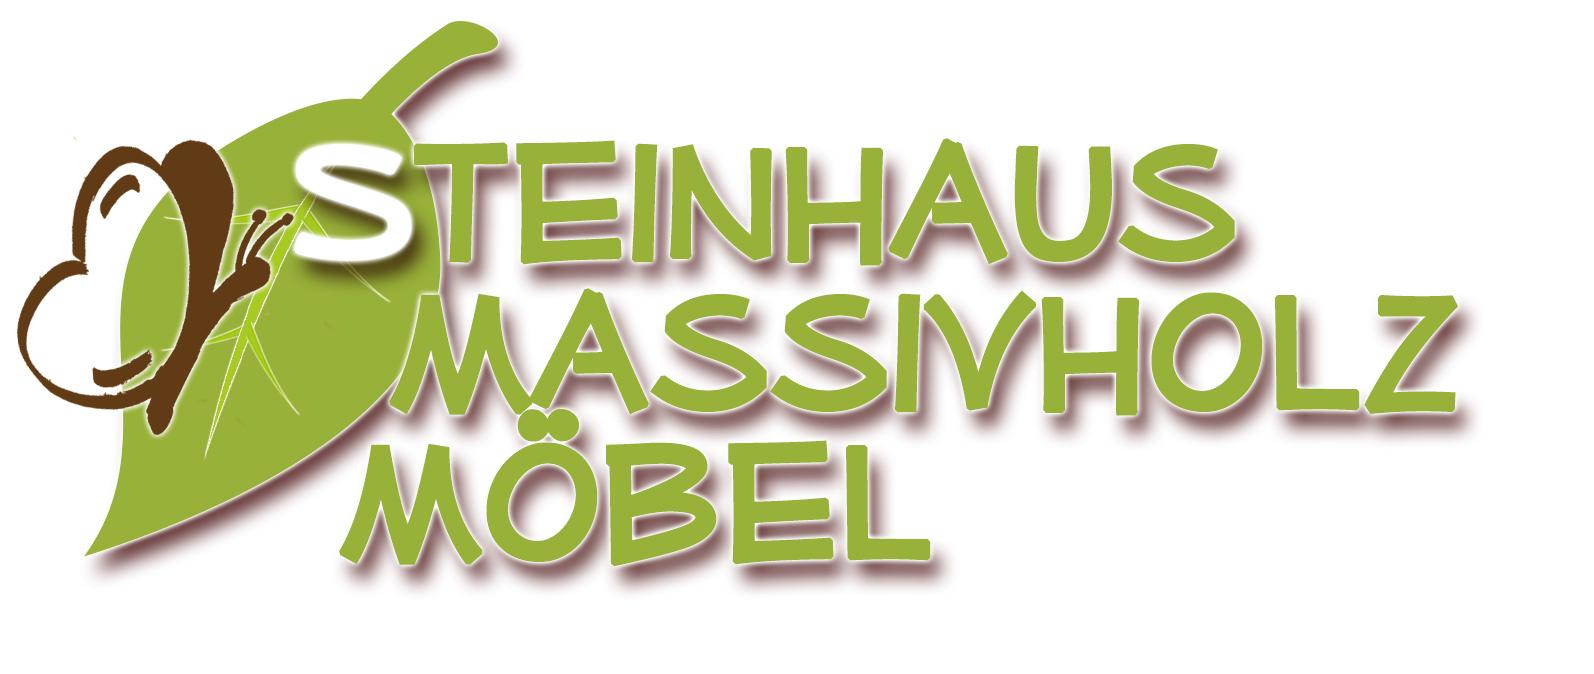 steinhaus-massivholzmoebel.shop